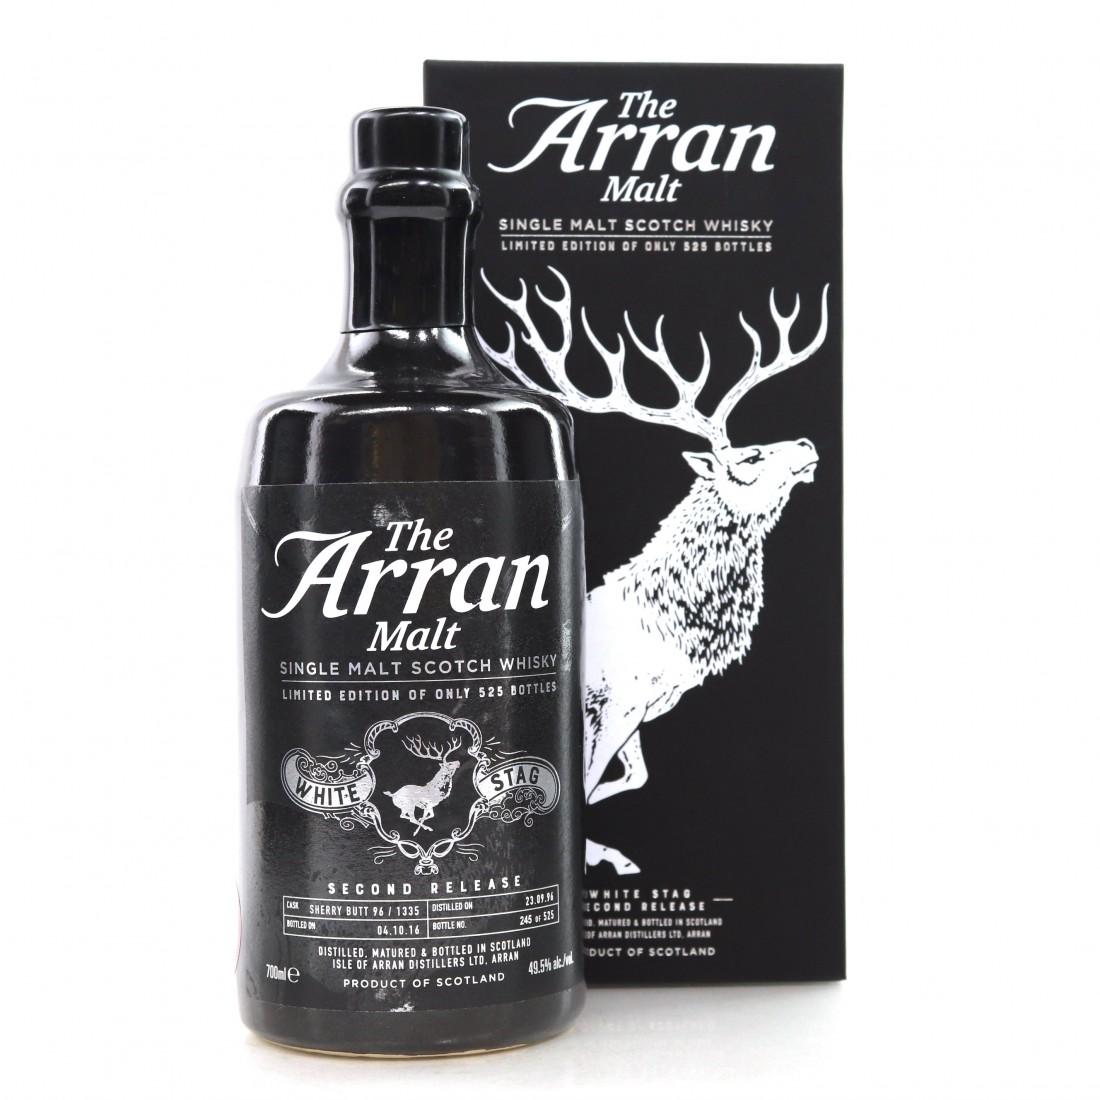 Arran White Stag Second Release